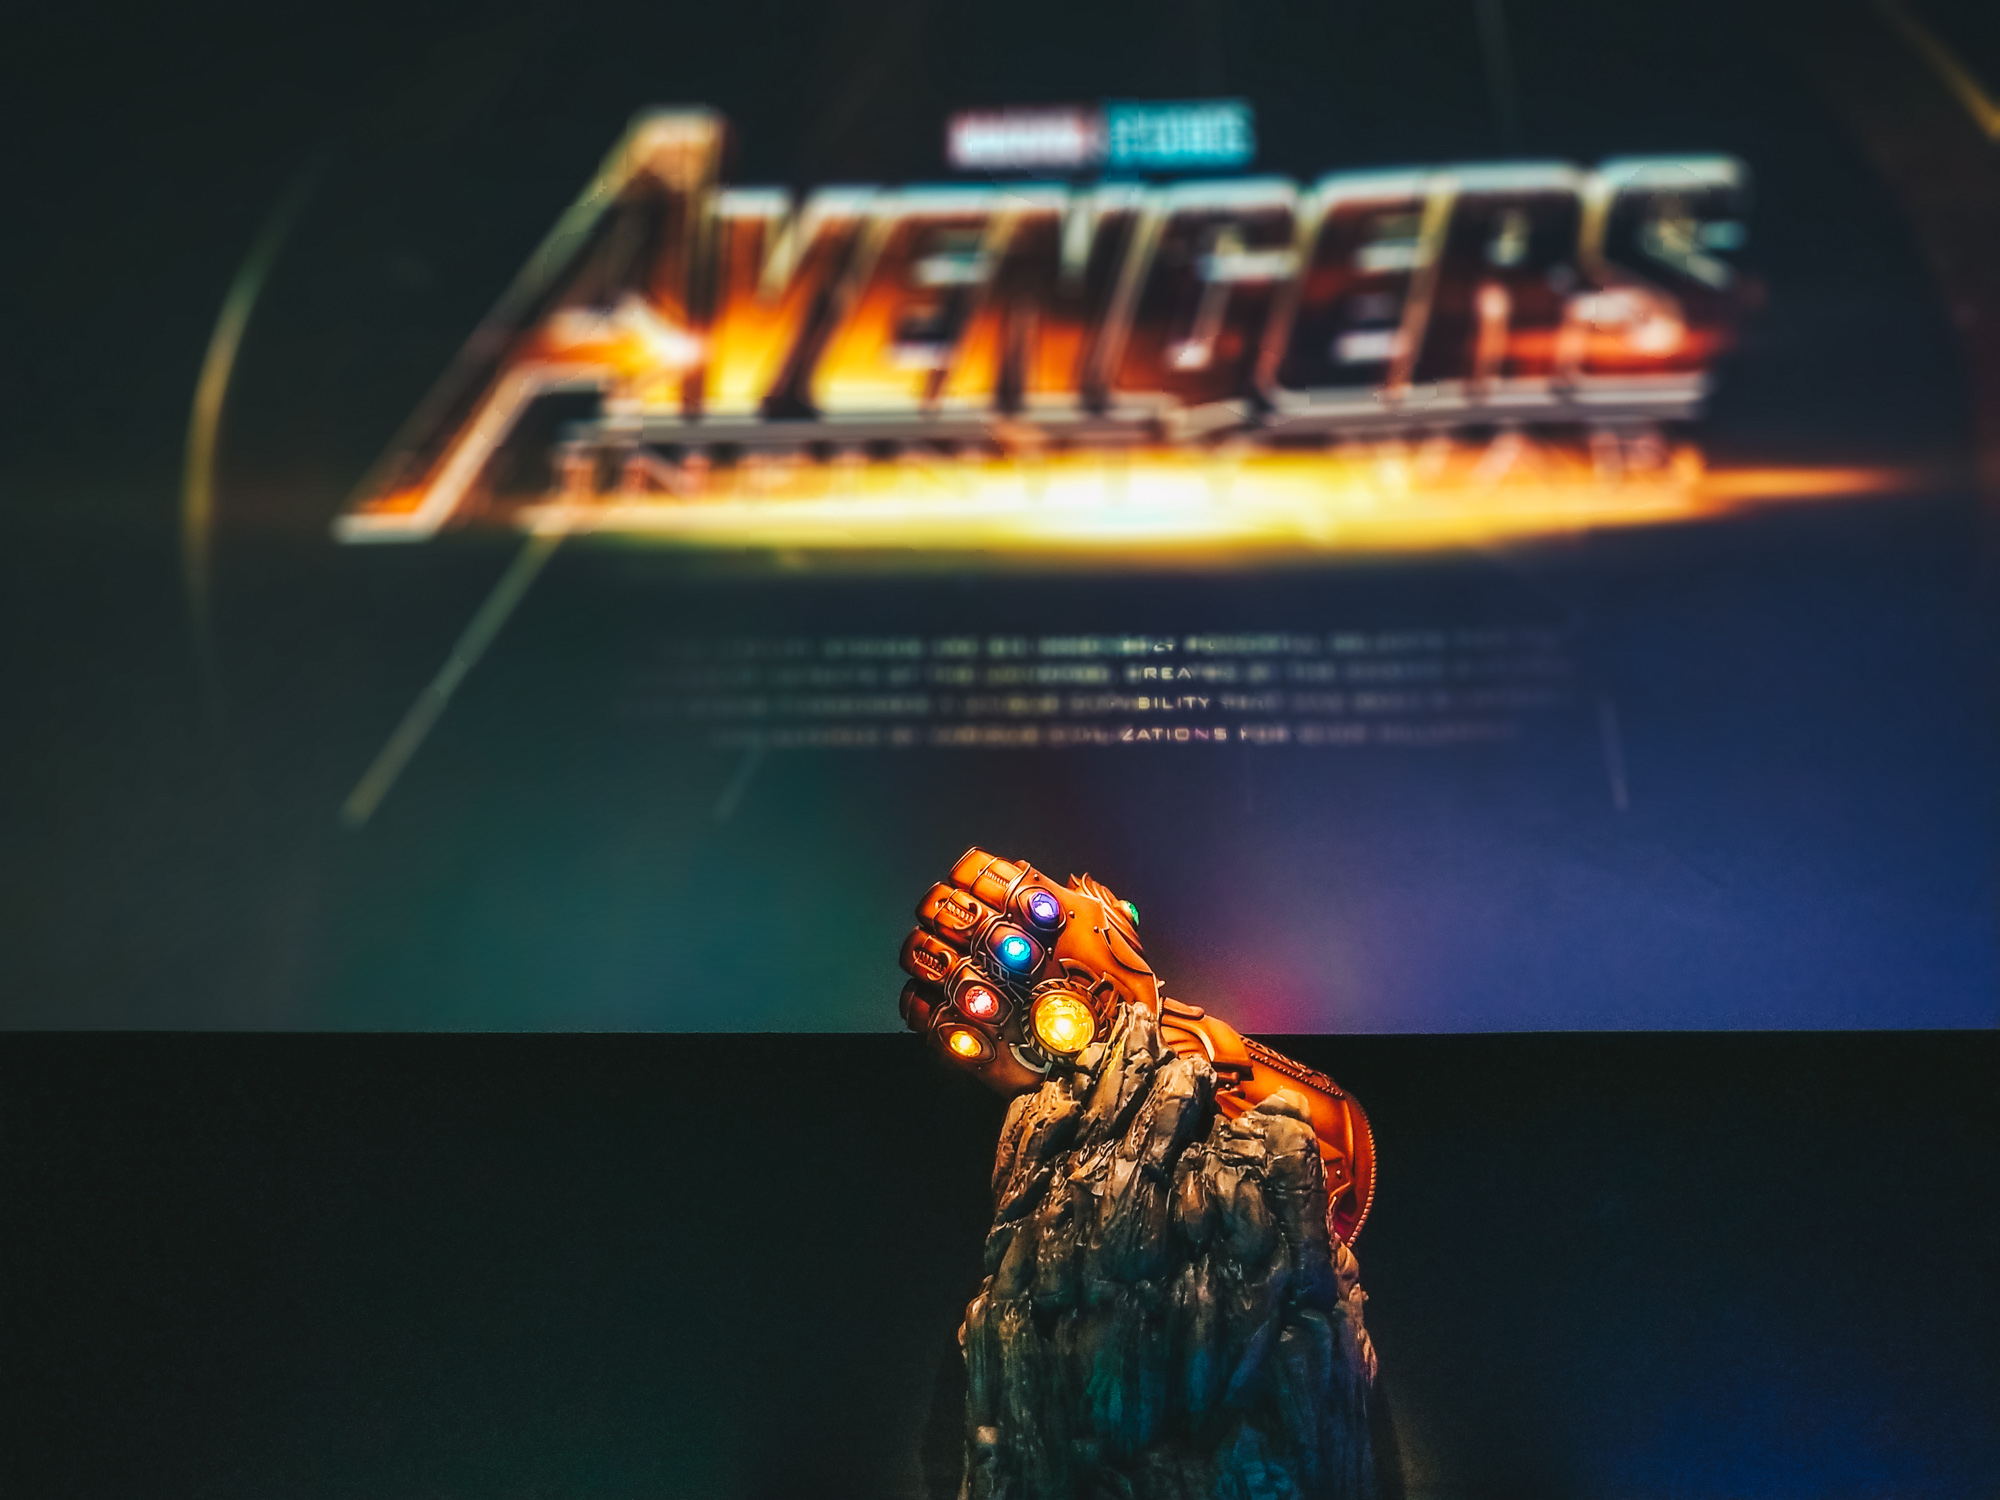 Marvel Studios: Ten Years of Heroes Exhibition Opens in Singapore